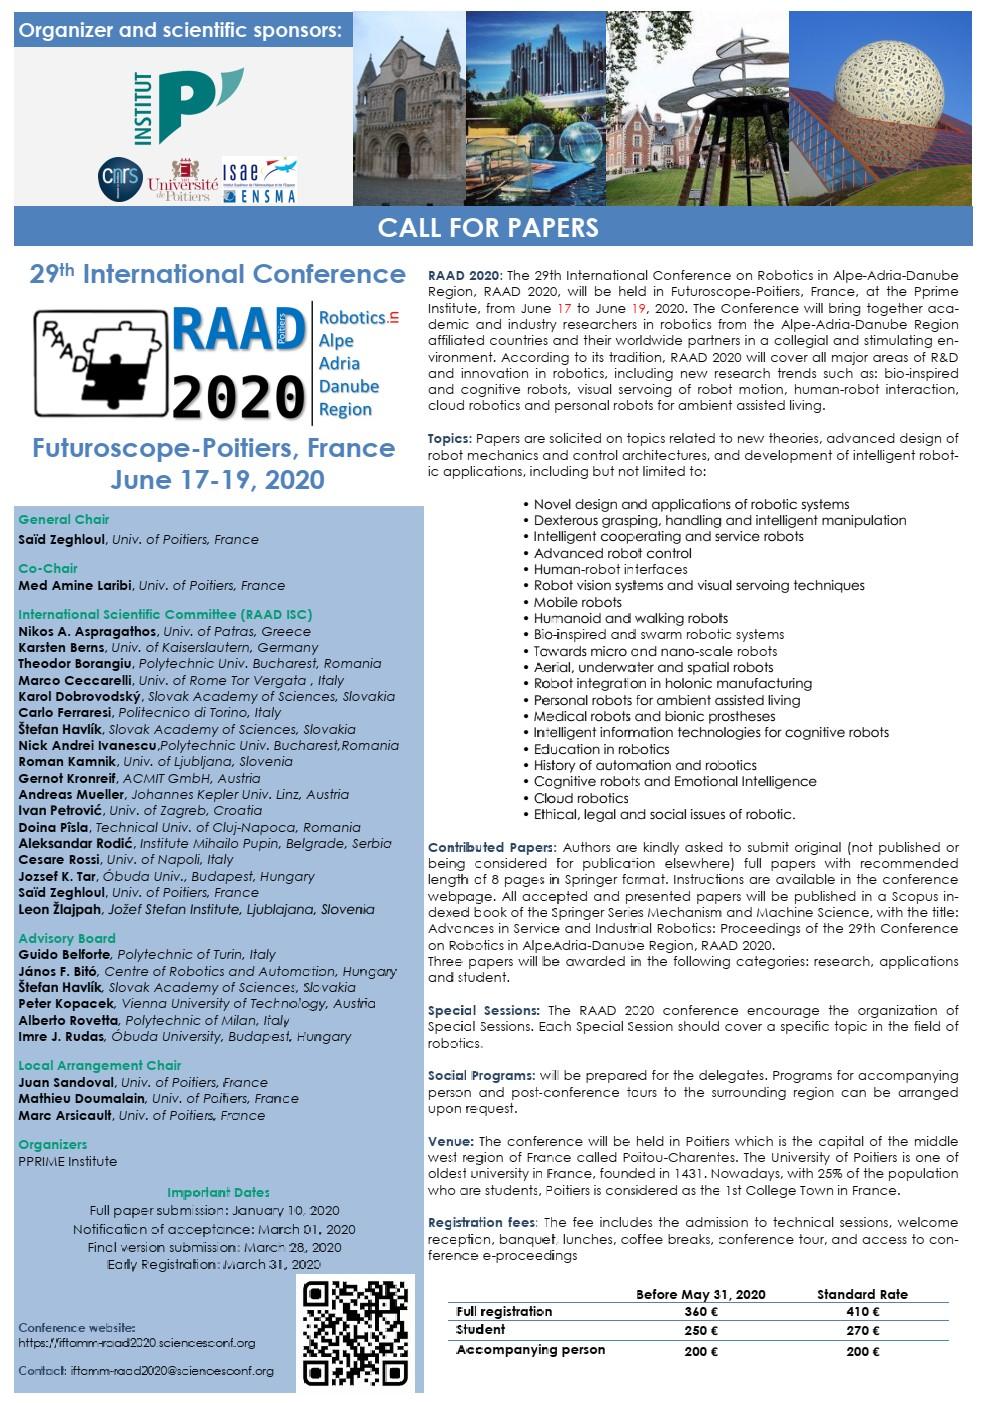 CfP_RAAD2020